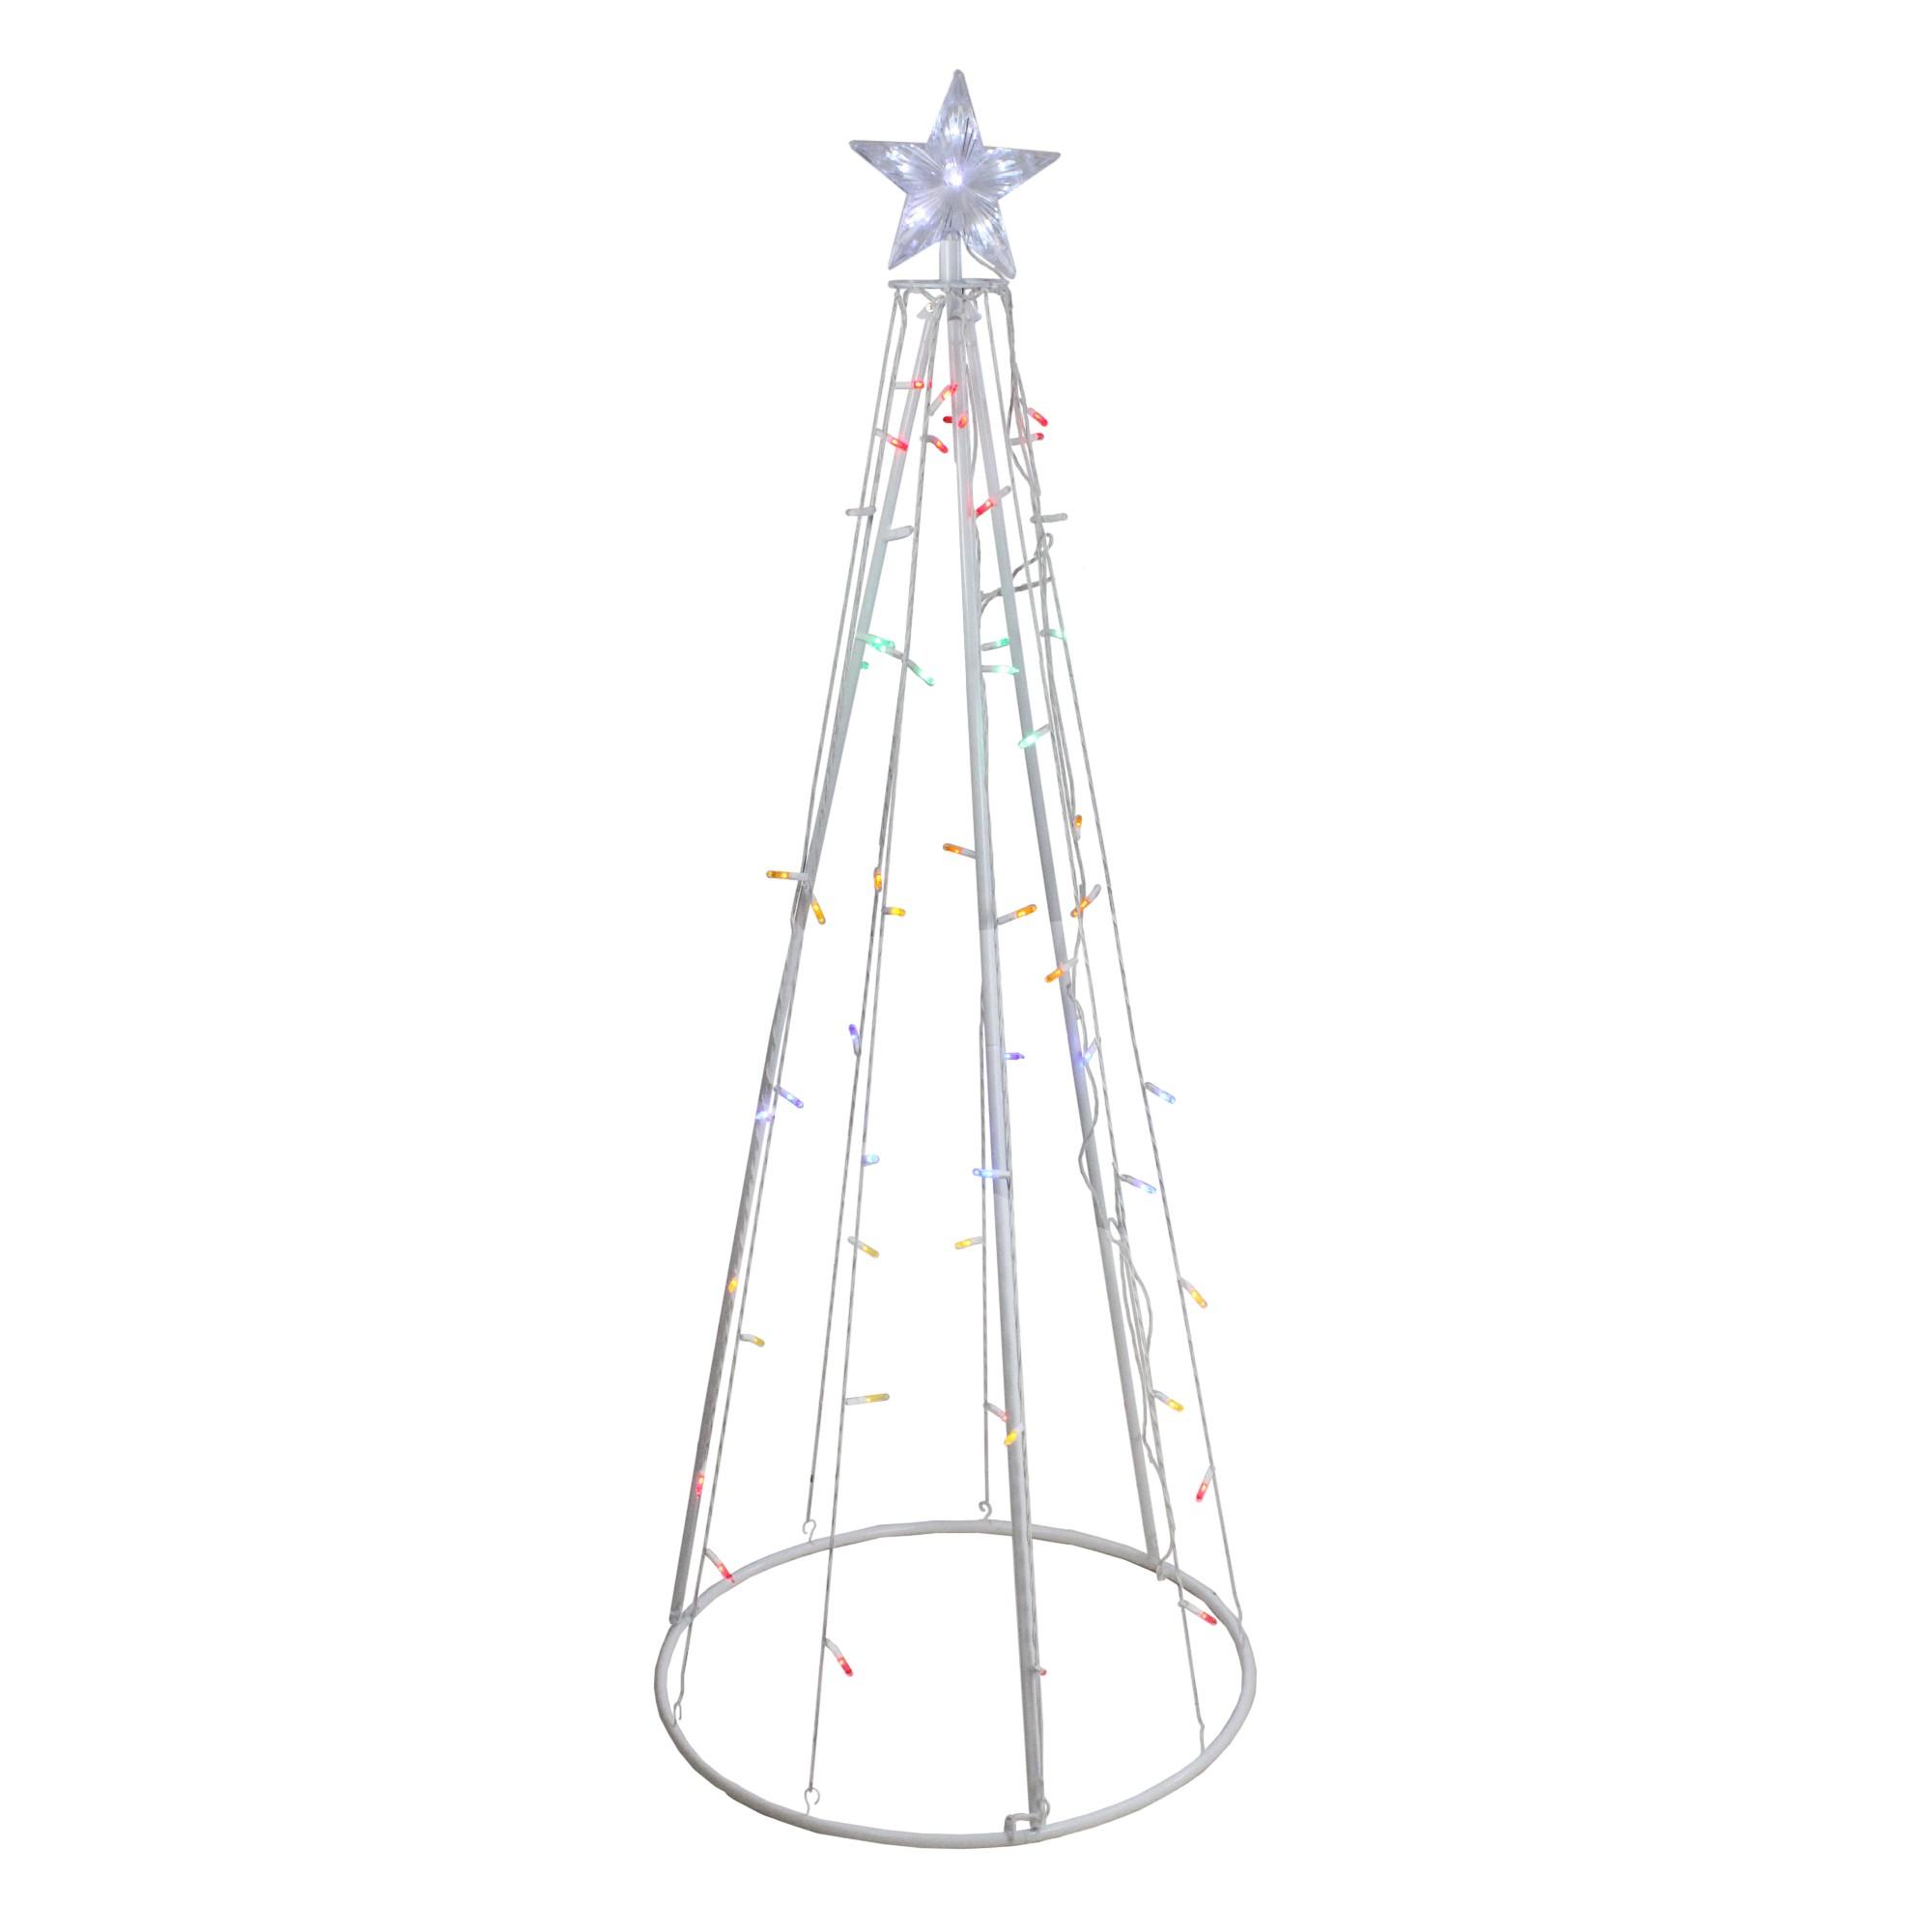 Northlight 5' Prelit Artificial Christmas Tree Show Cone